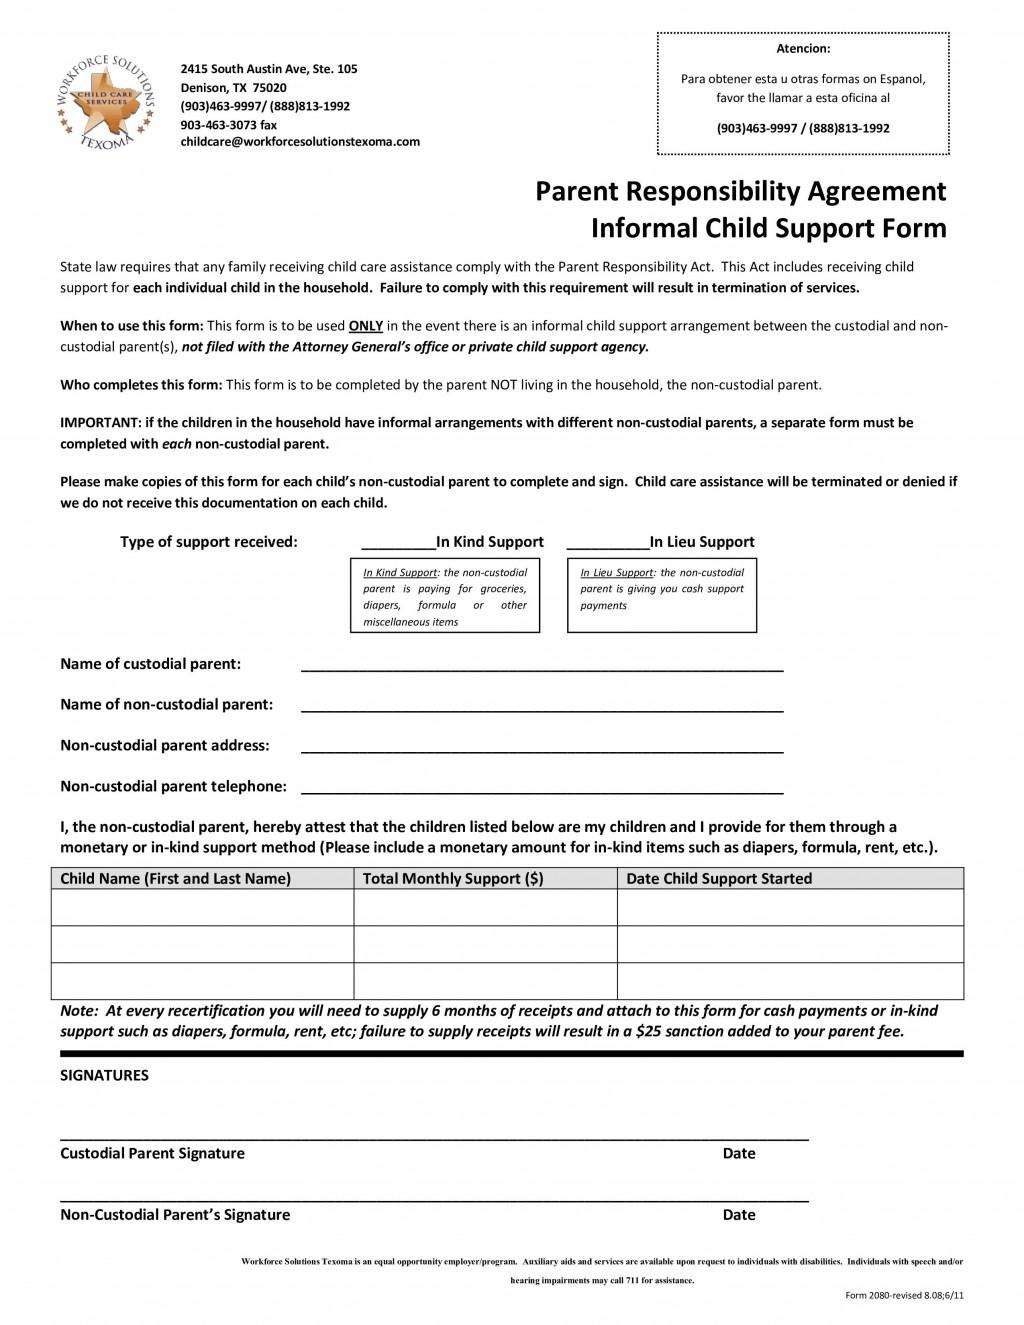 003 Striking Child Support Agreement Template Concept  Australia Bc AlbertaLarge